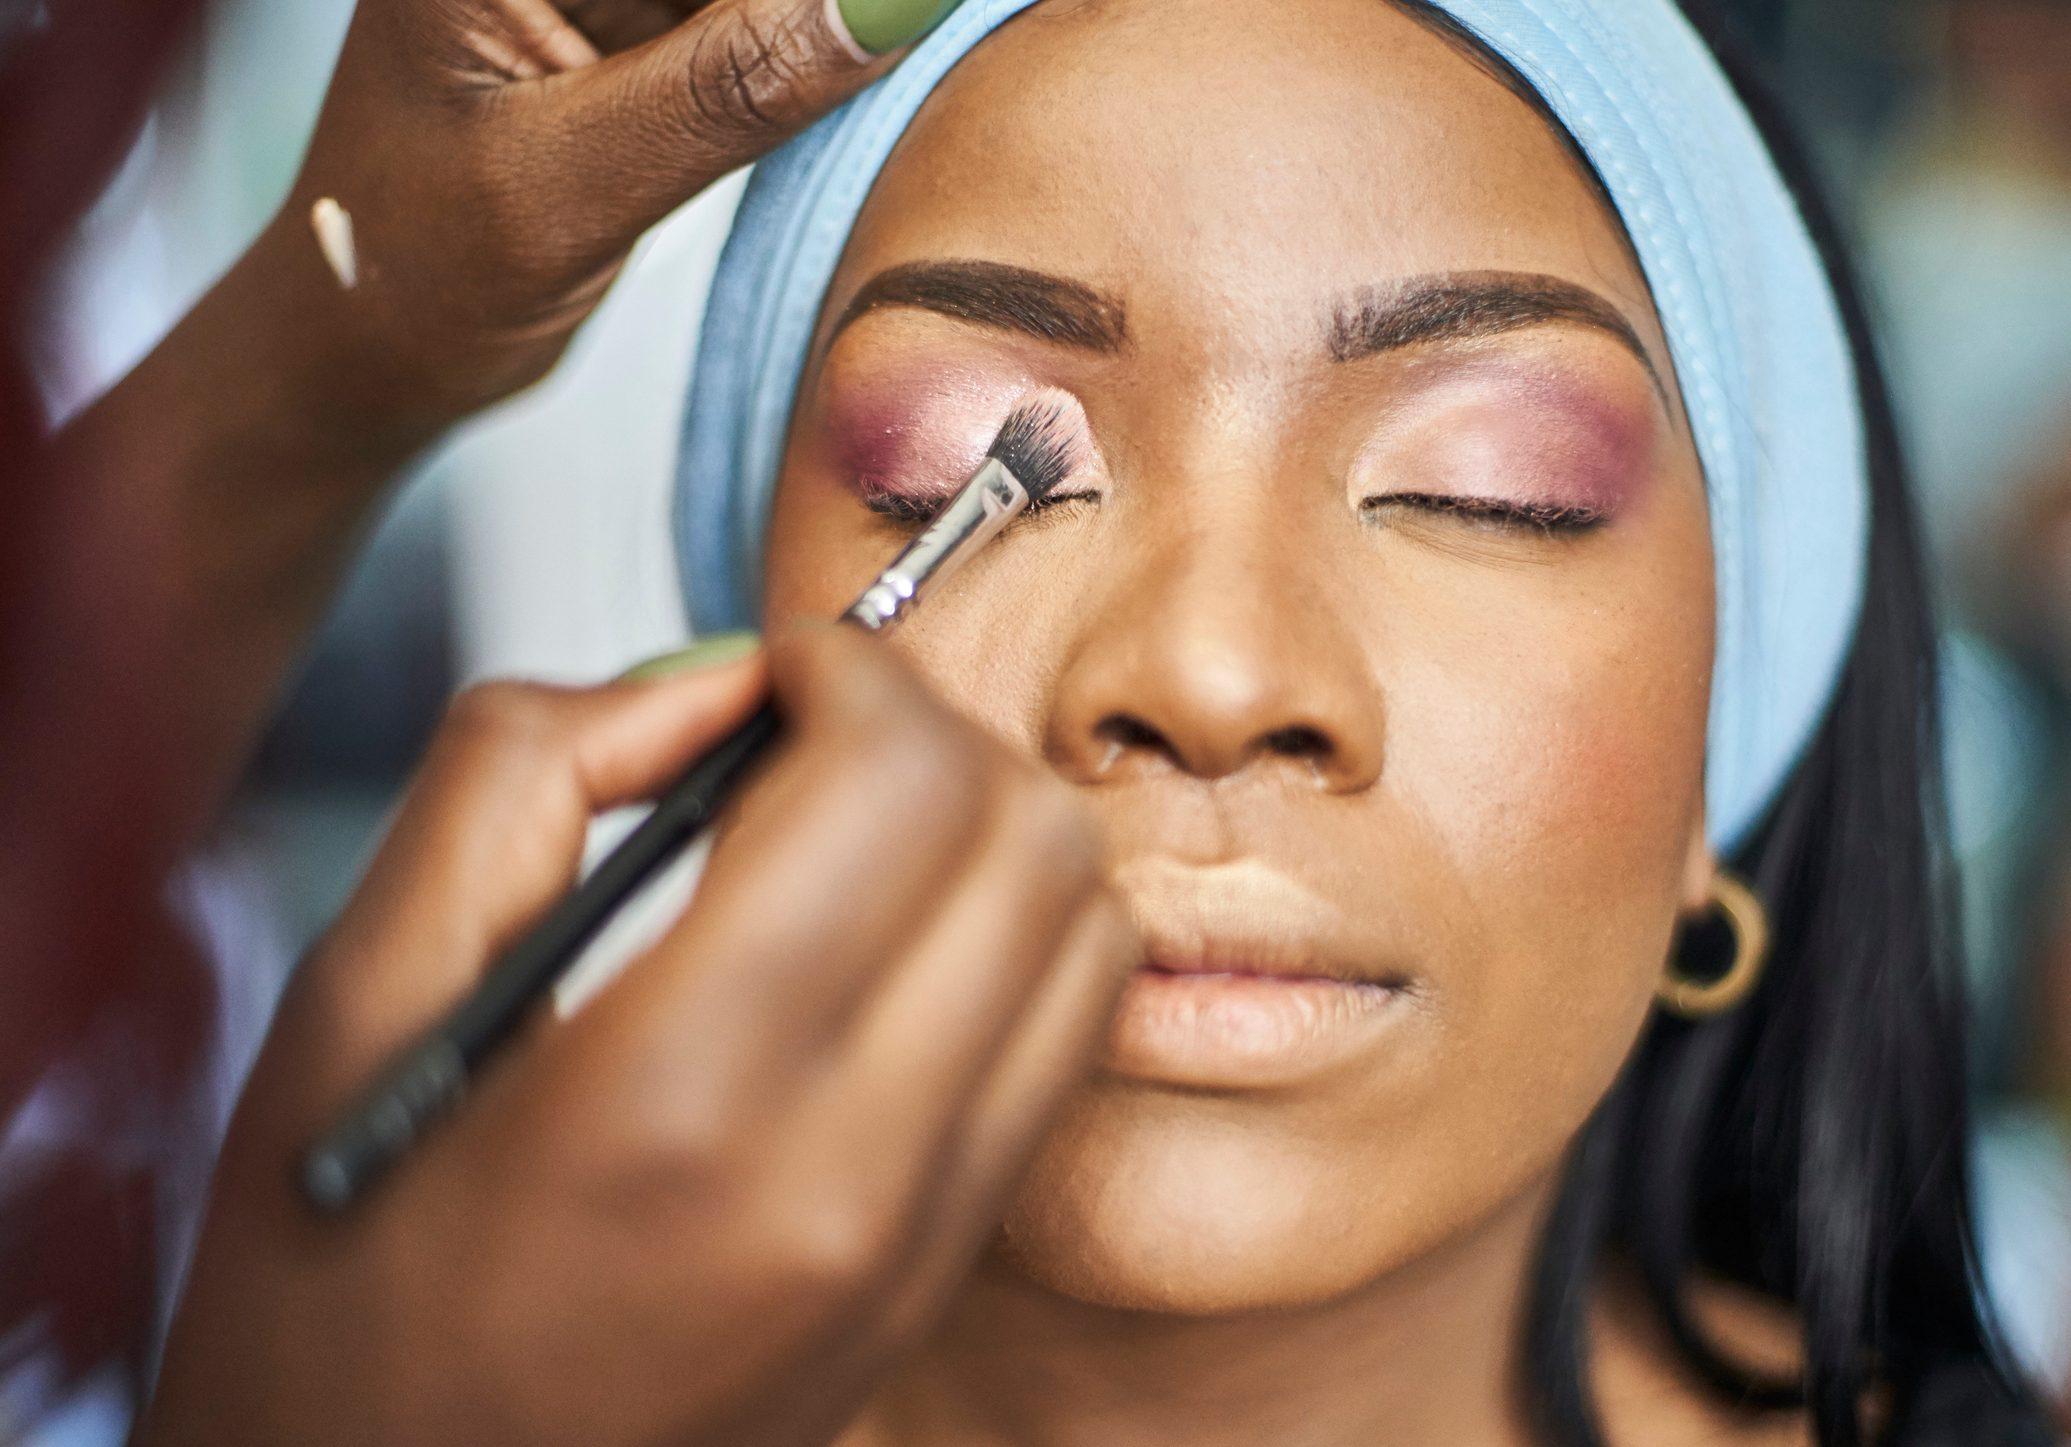 Visagiste applying makeup